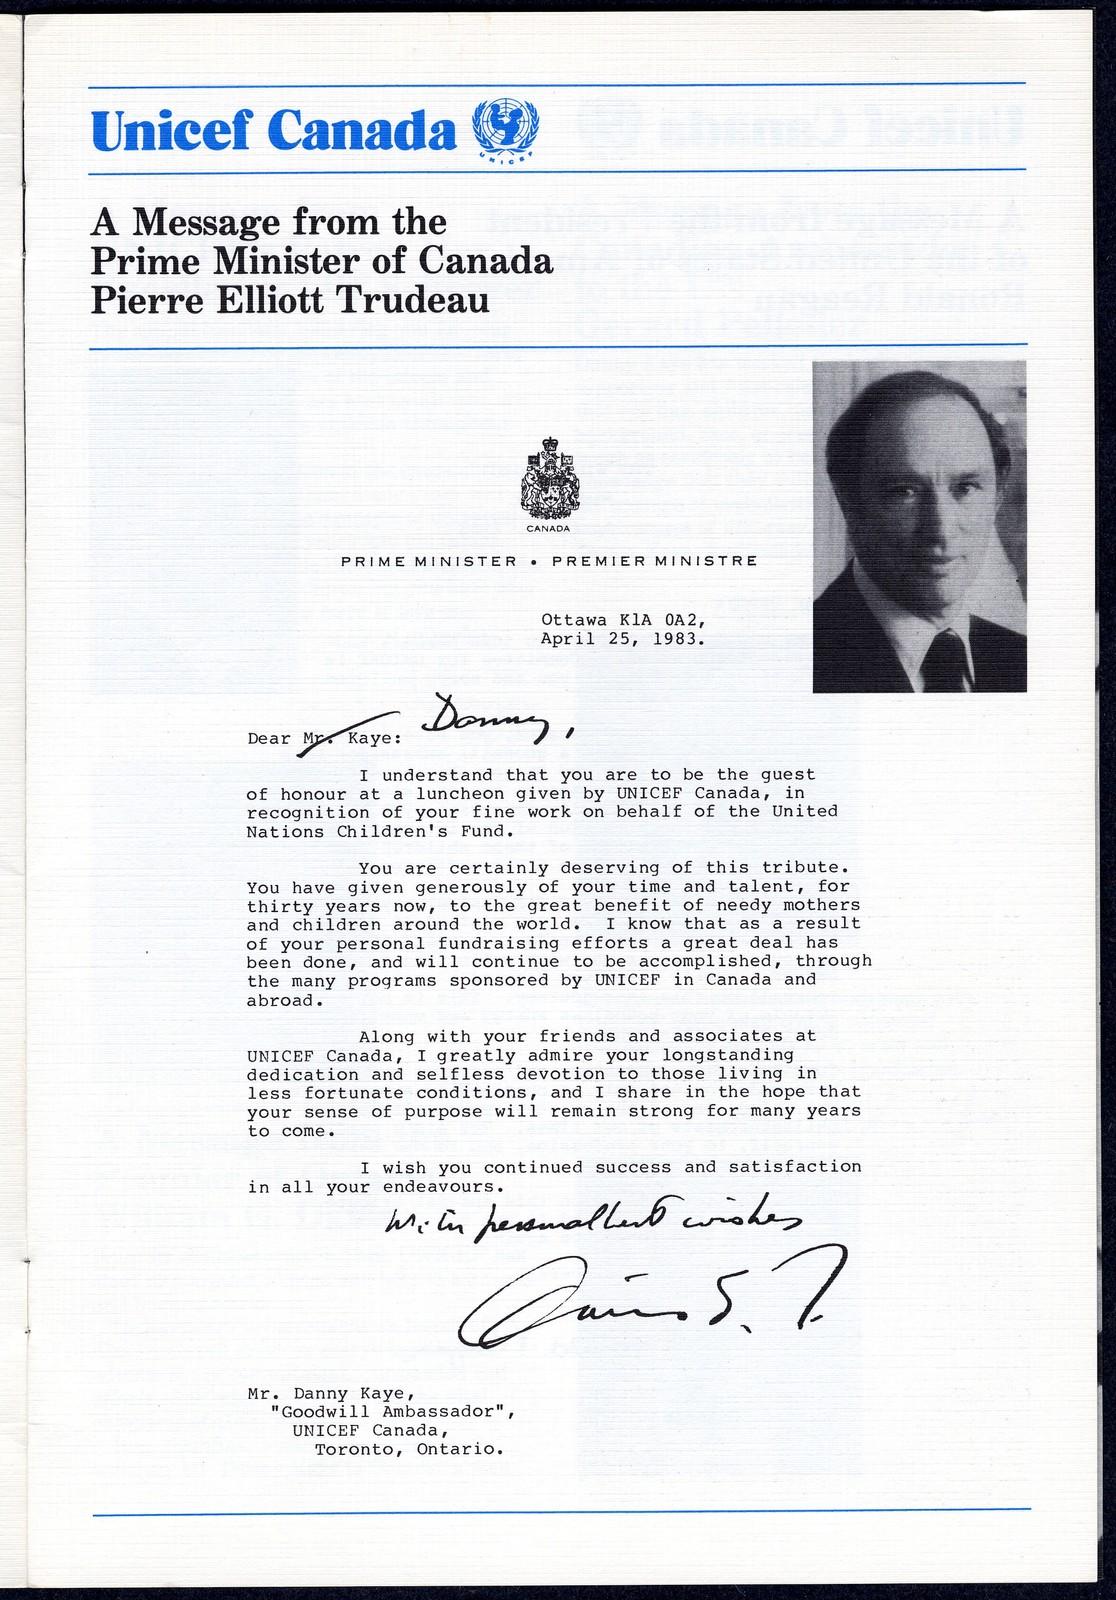 UNICEF Canada honours Danny Kaye, 30th Anniversary as Goodwill Ambassador, June 23, 1983